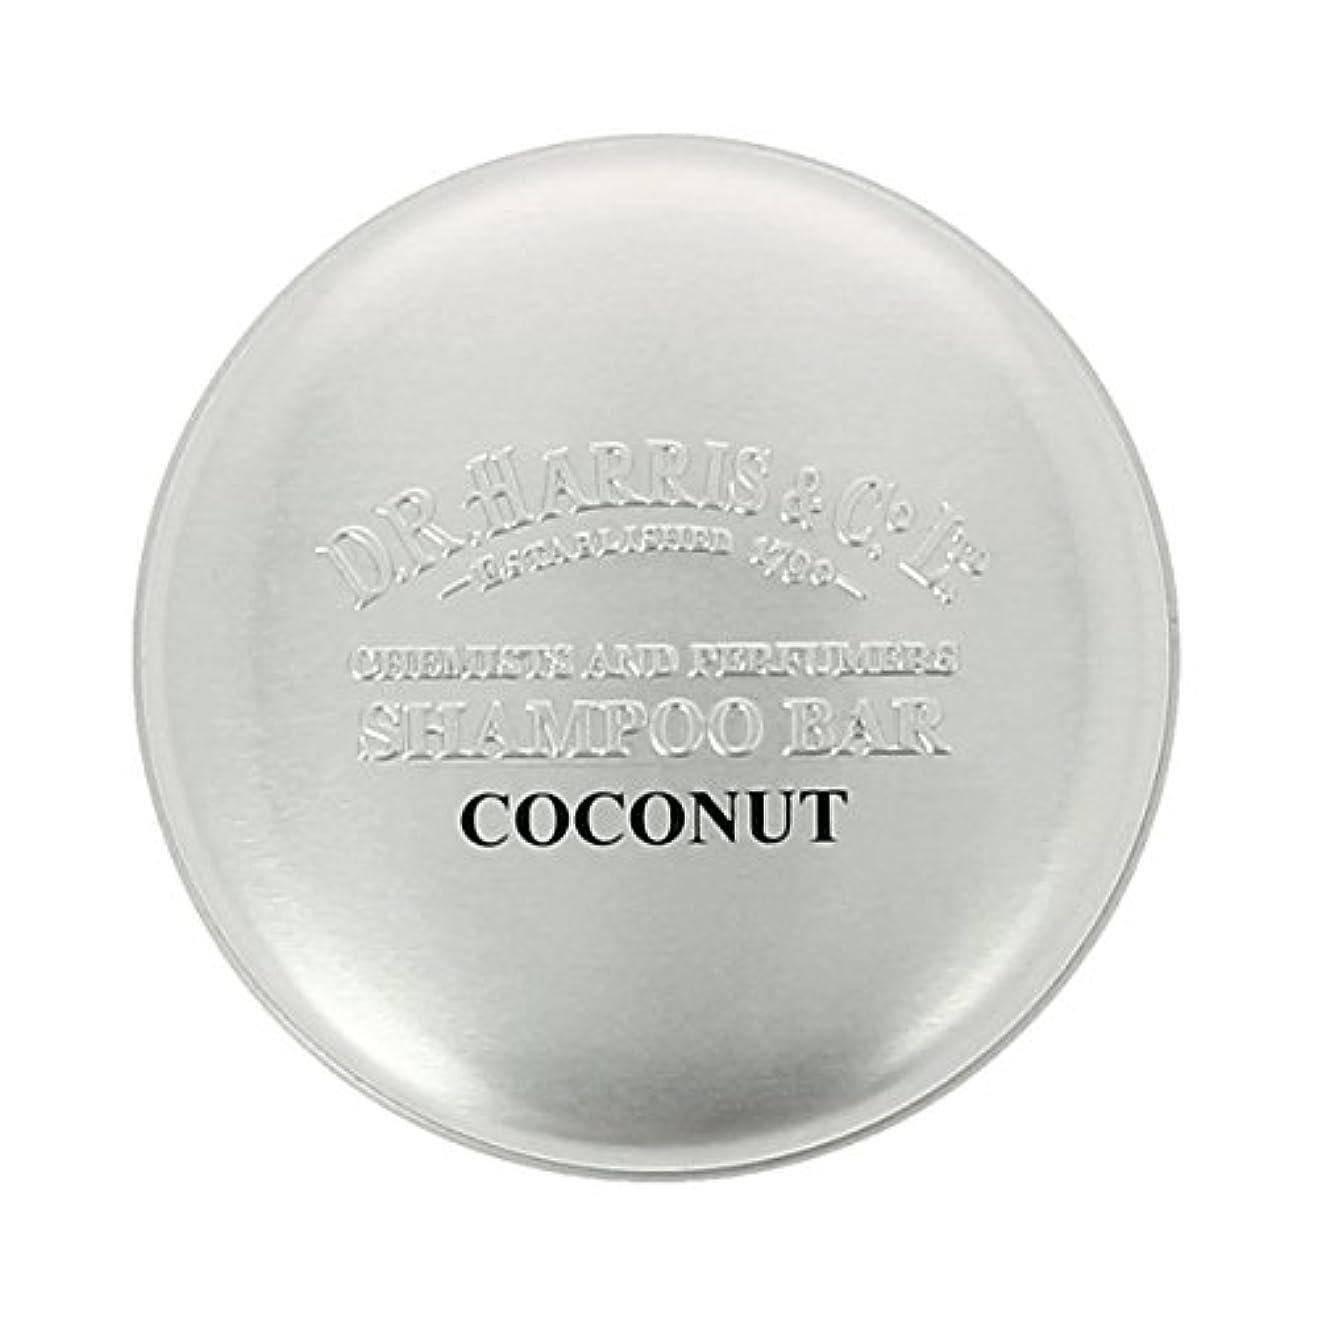 D Rハリス ココナッツシャンプーバー50g[海外直送品] [並行輸入品]